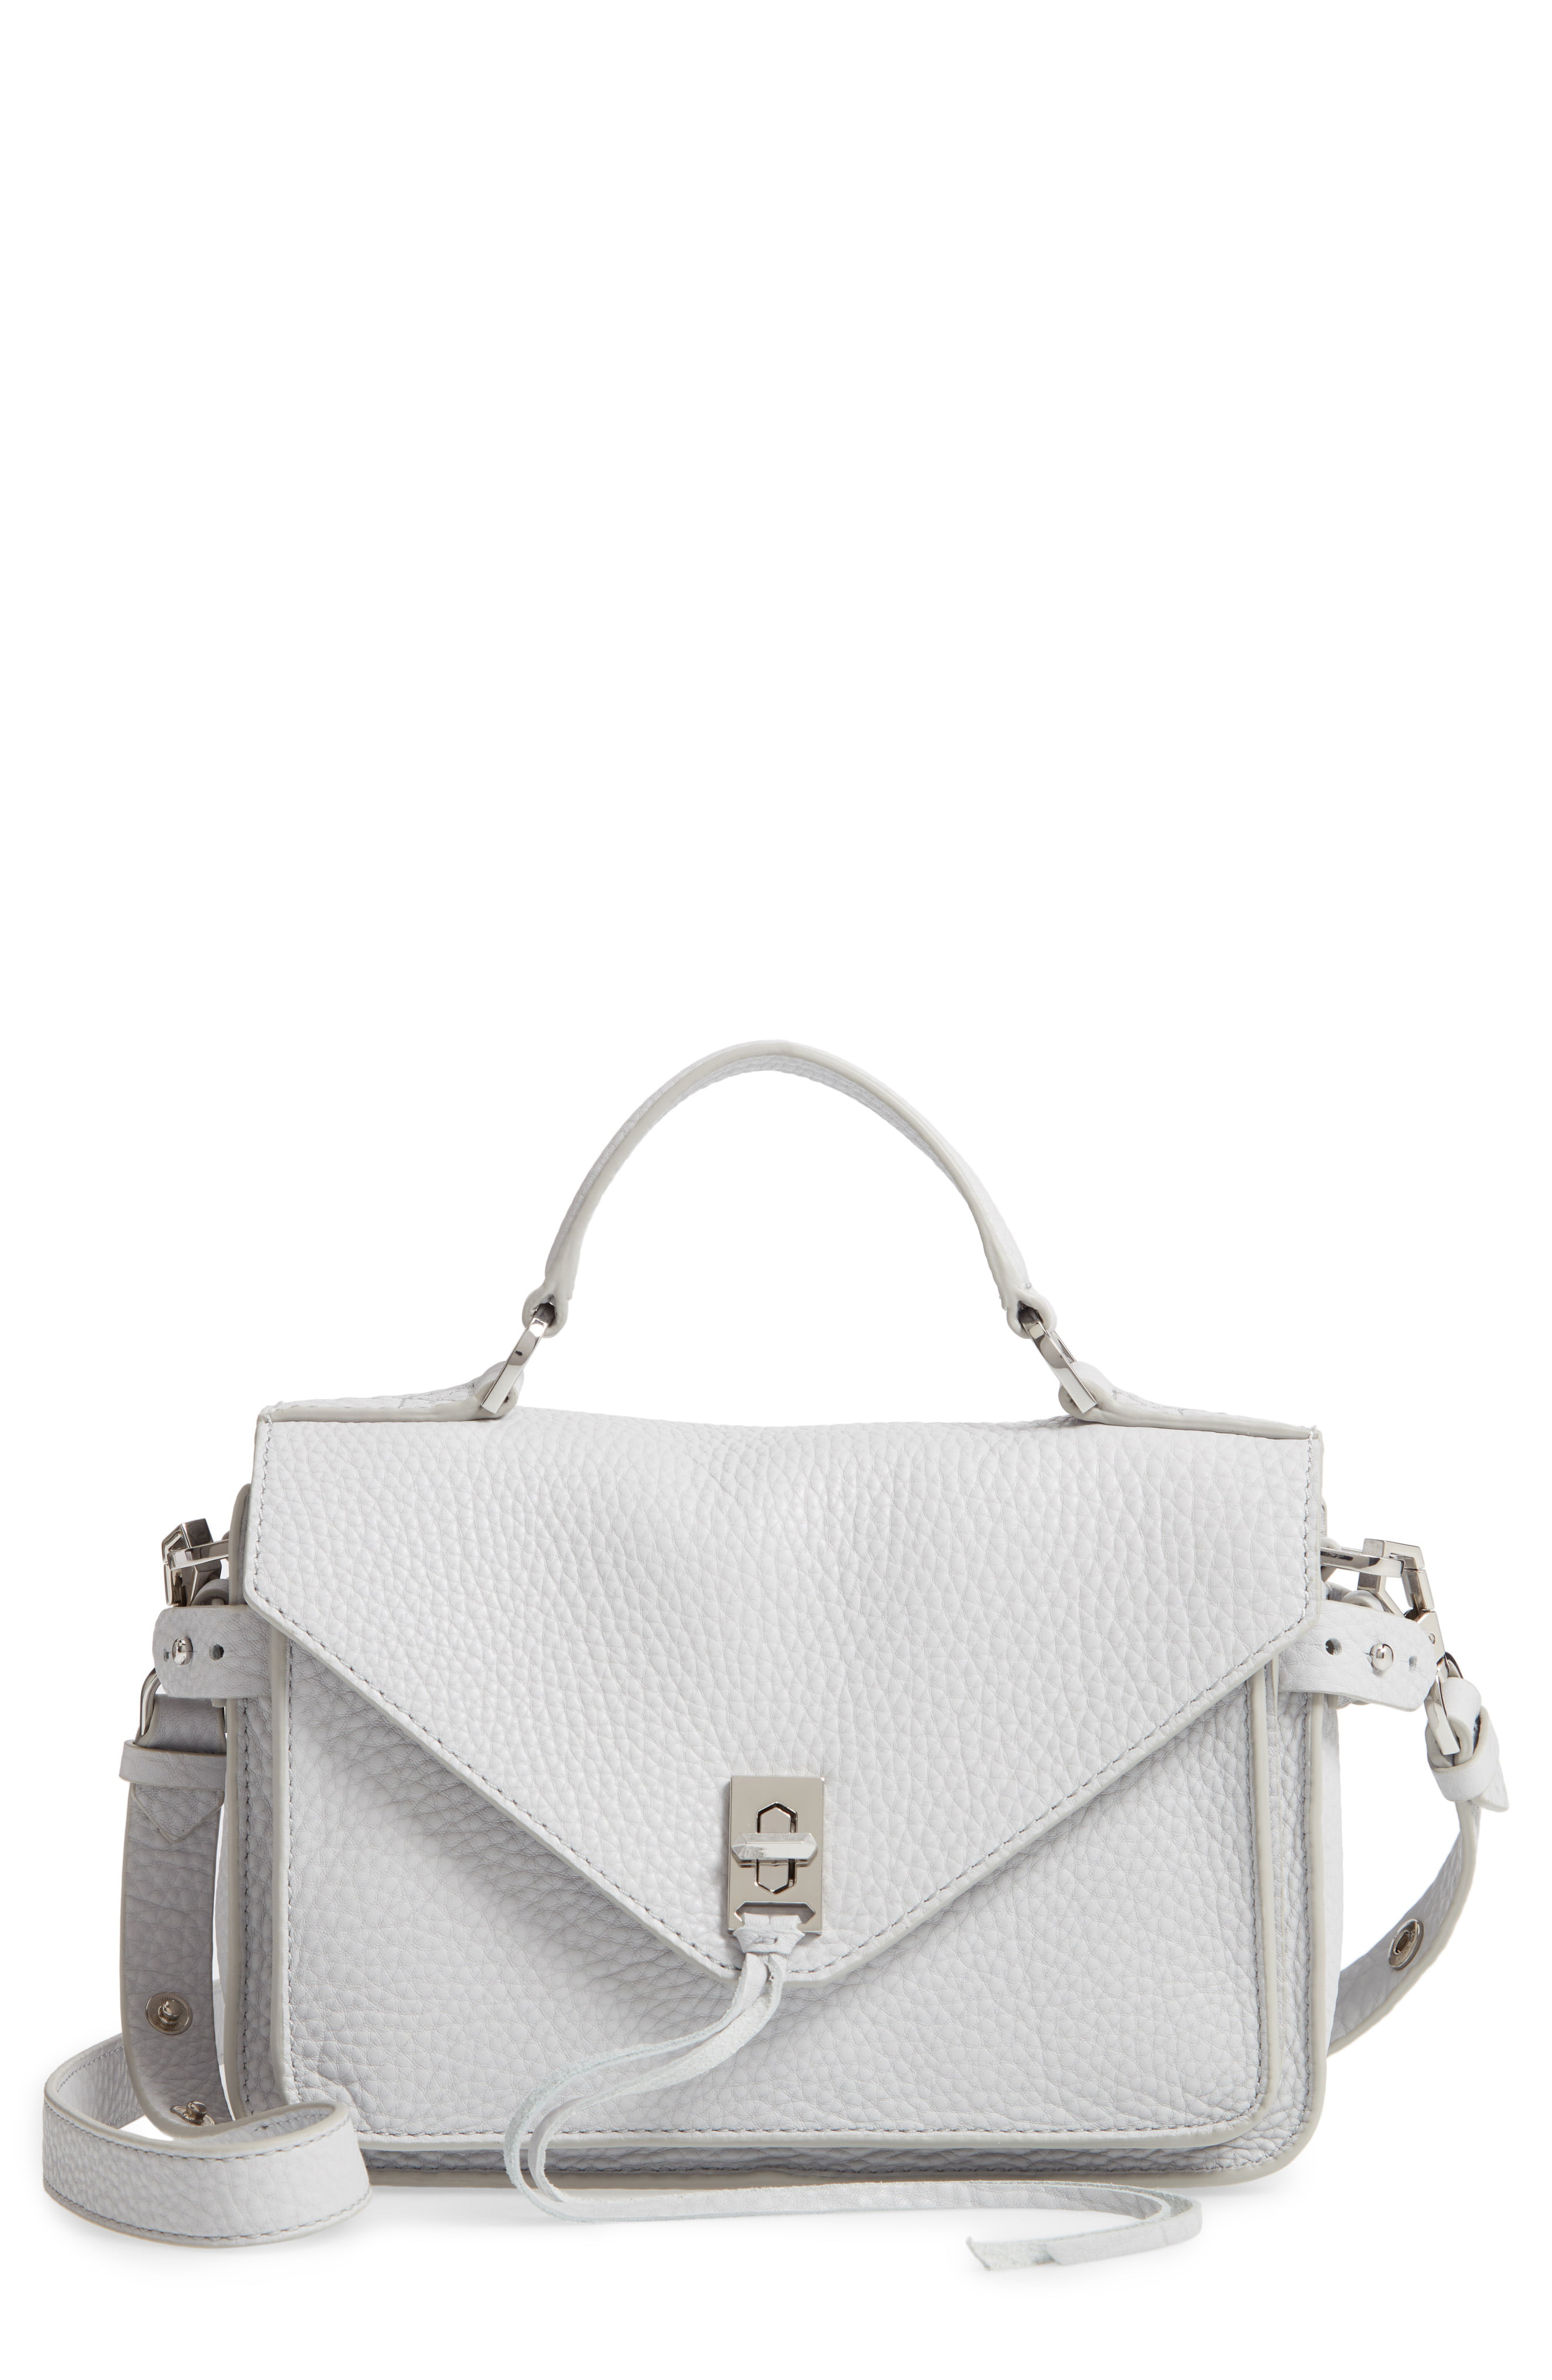 united states wide range recognized brands Rebecca Minkoff 'Small Darren' Leather Messenger Bag | Leather ...